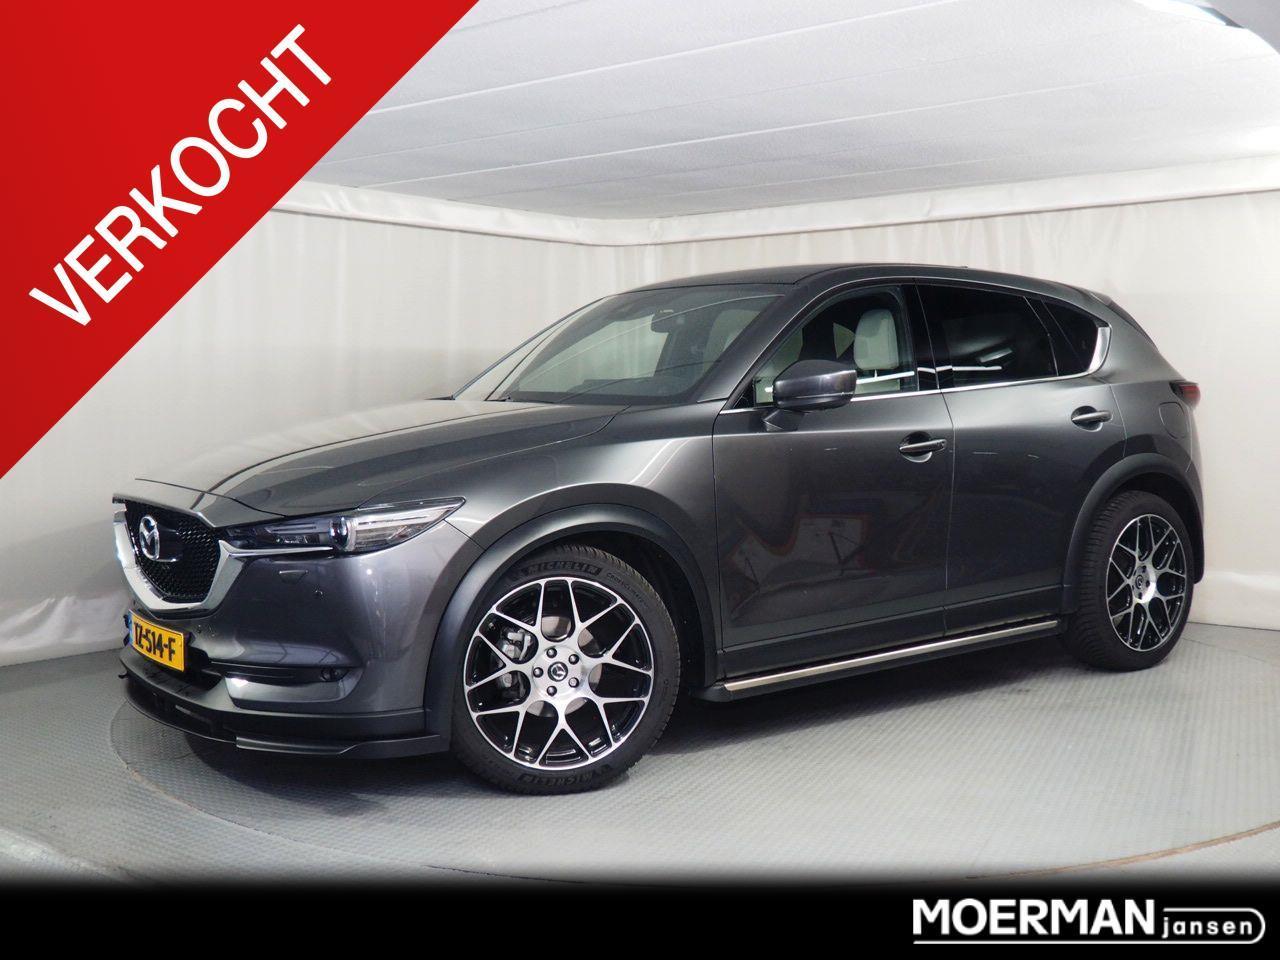 Mazda Cx-5 Rogue edition! / verkocht